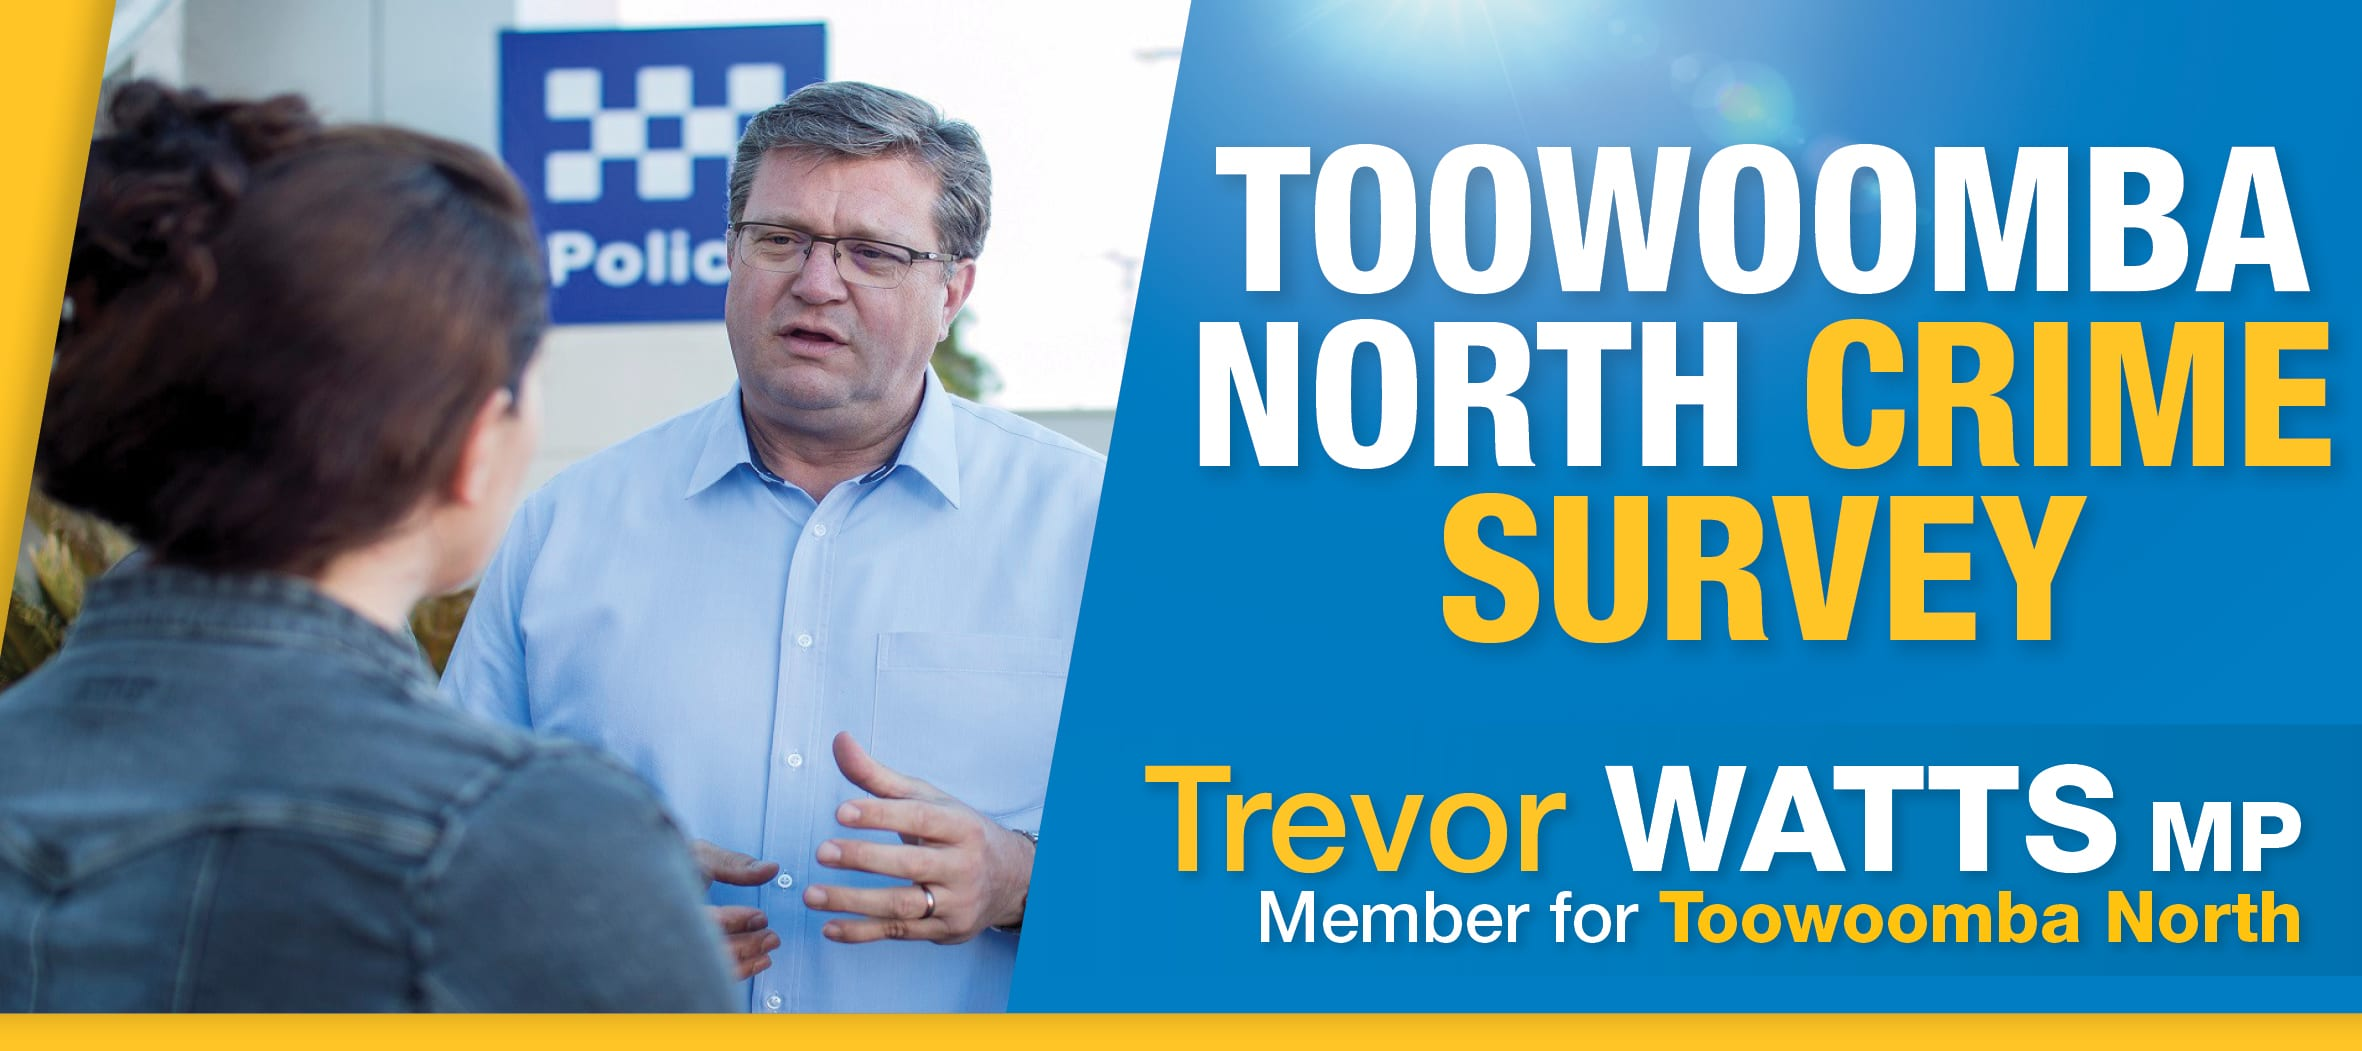 SE24_Toowoomba North Crime Survey Header